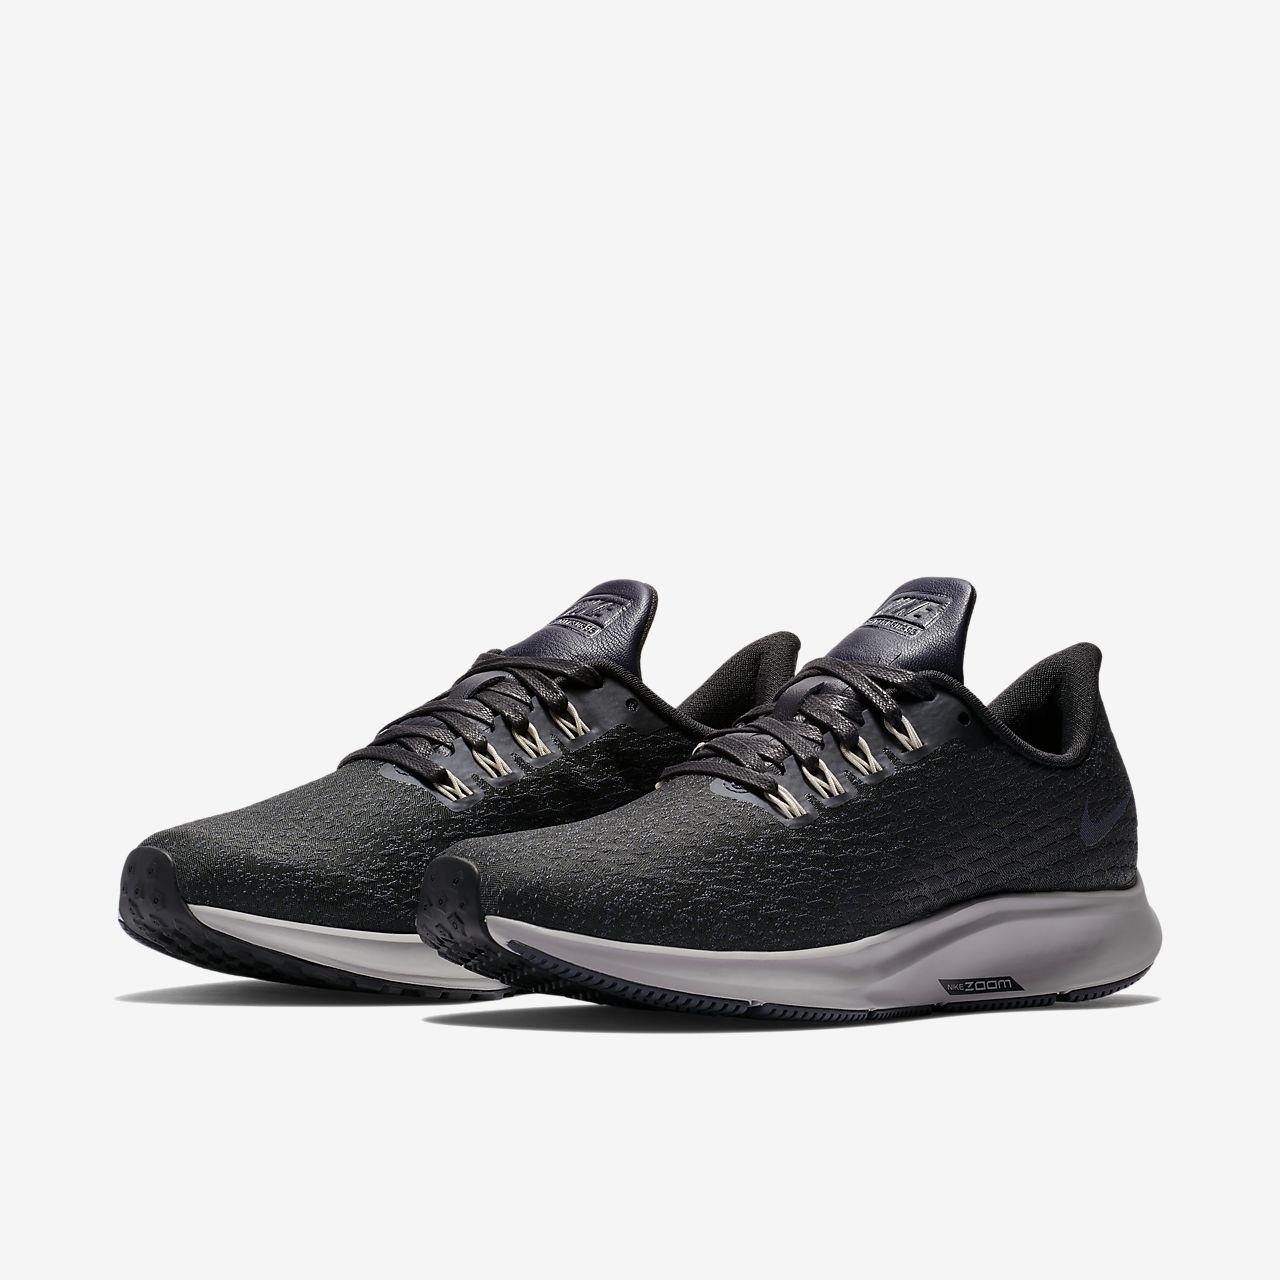 d699153dd25 Nike Air Zoom Pegasus 35 Premium Women s Running Shoe. Nike.com CH